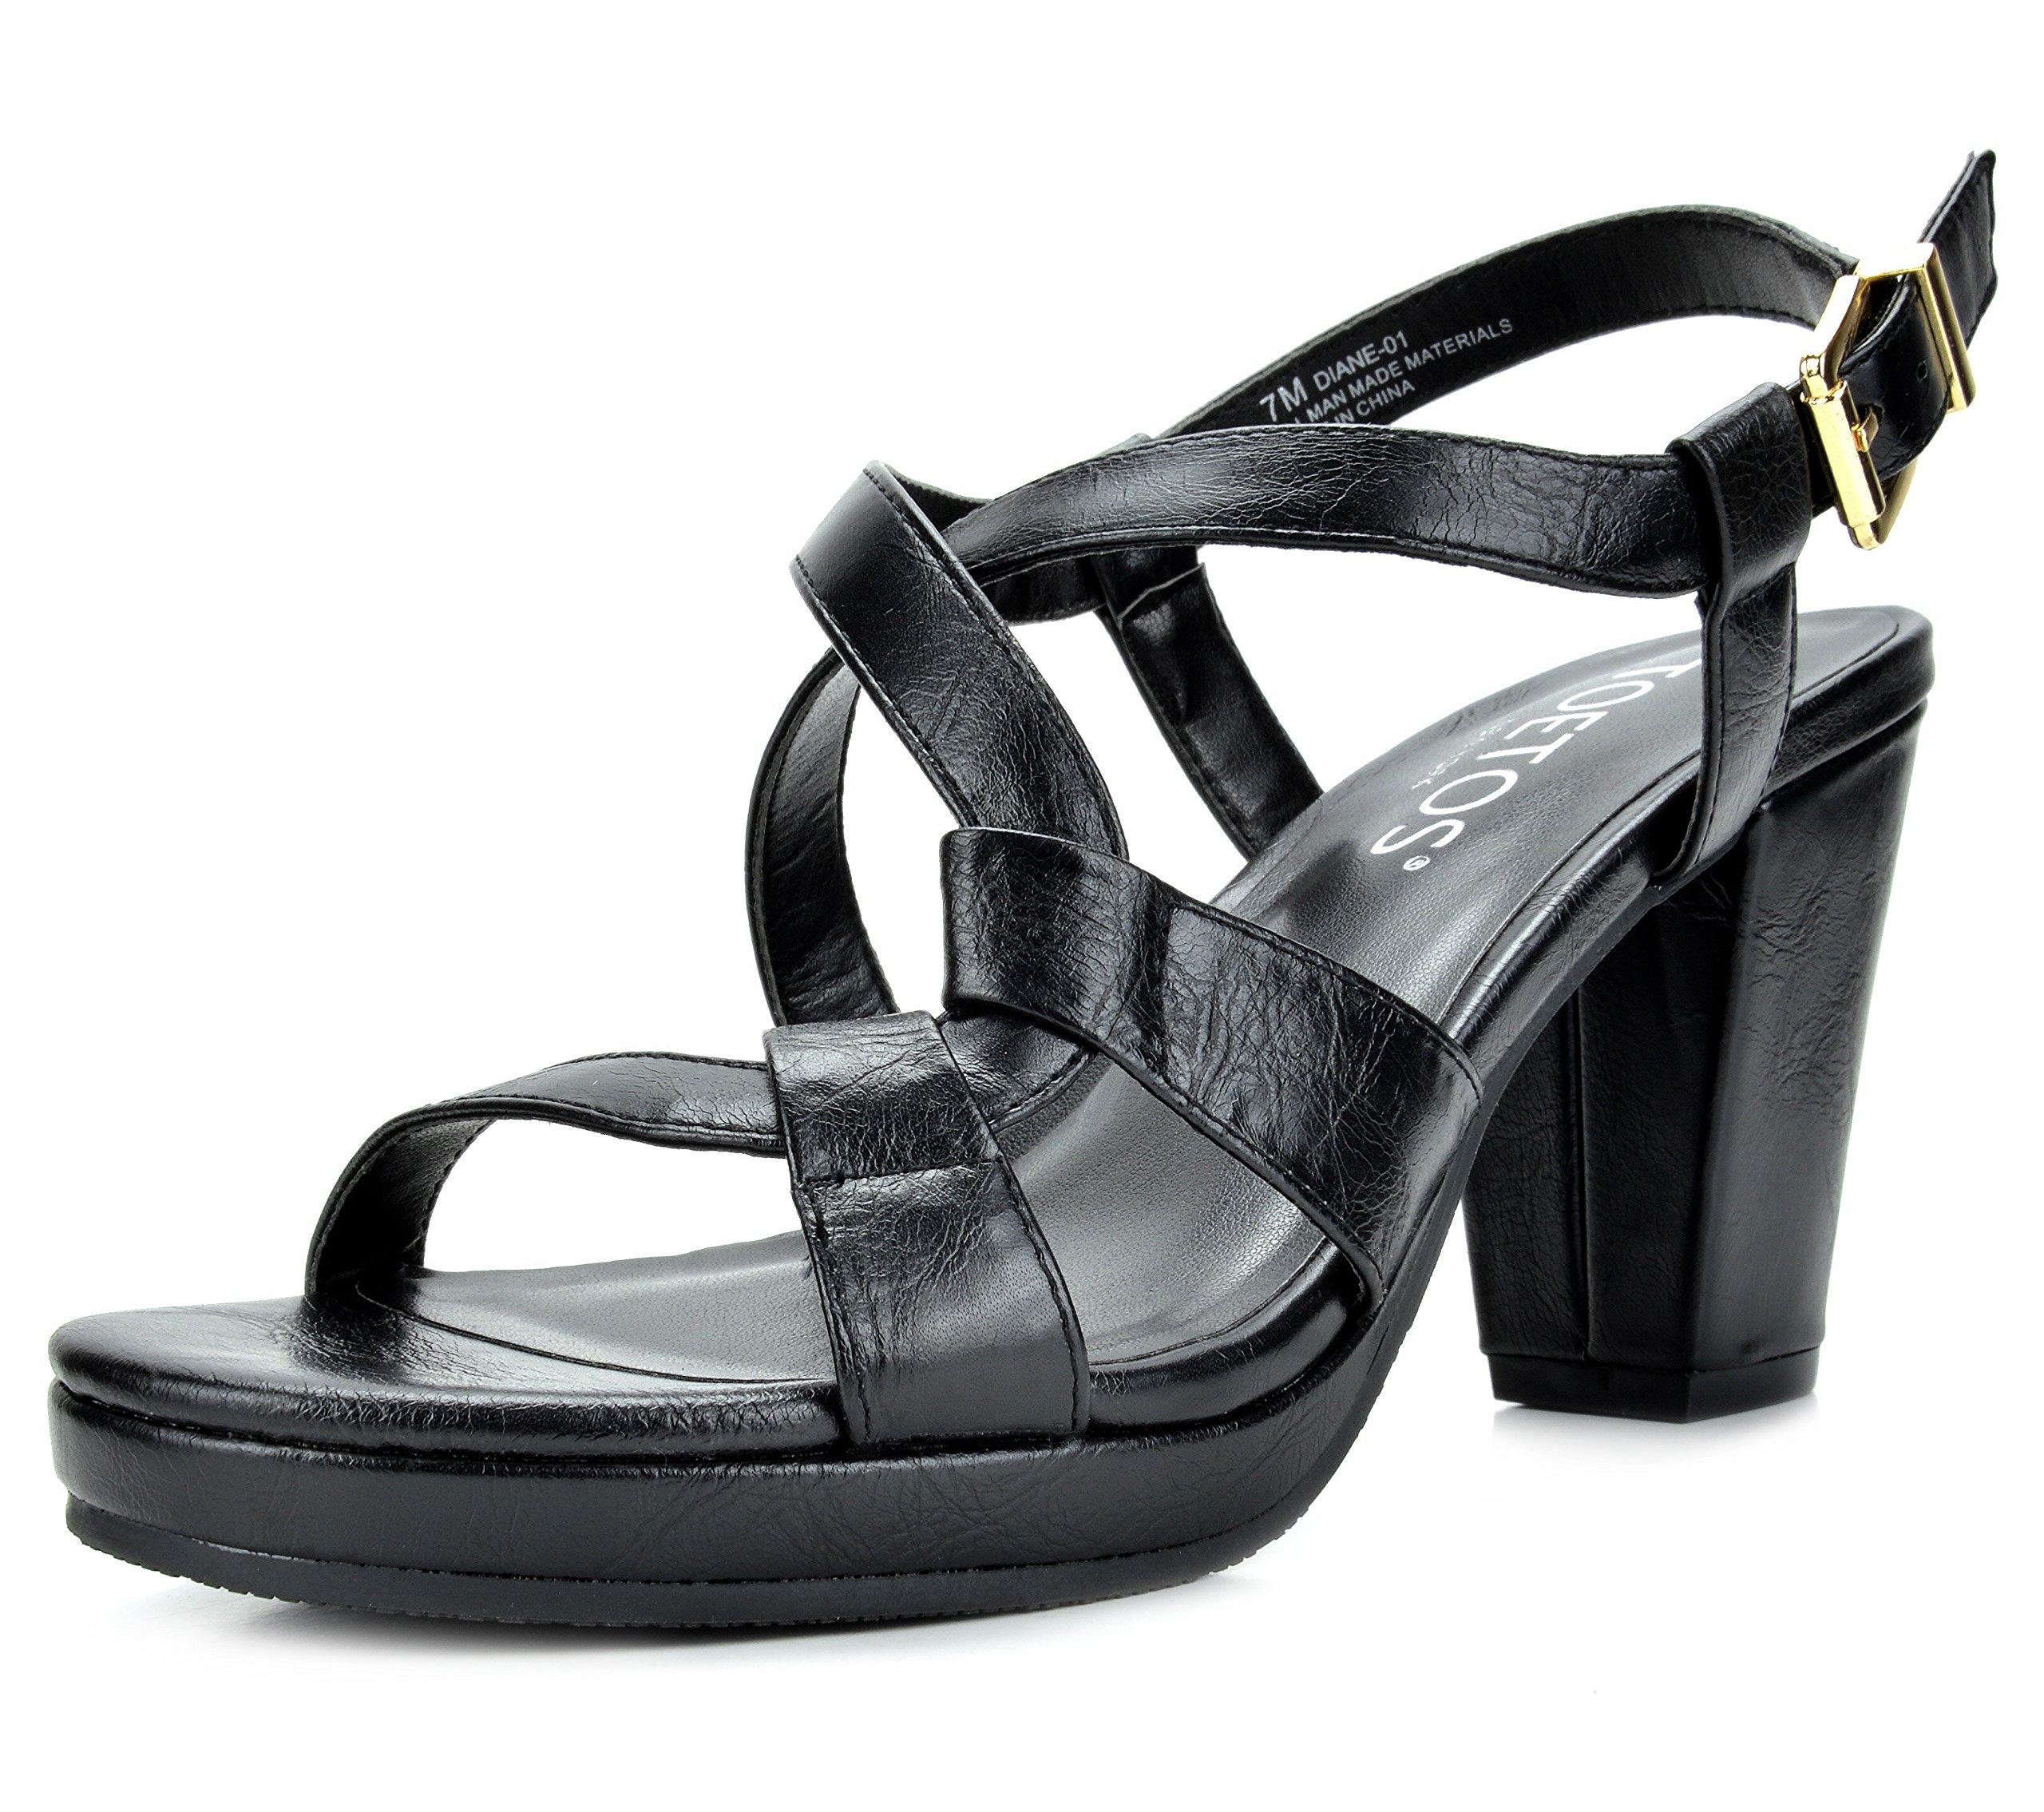 TOETOS DIANE-01 New Women's Cross Strap Open Toes Mid Chunky Heels Platform Dress Sandals Black Size 9